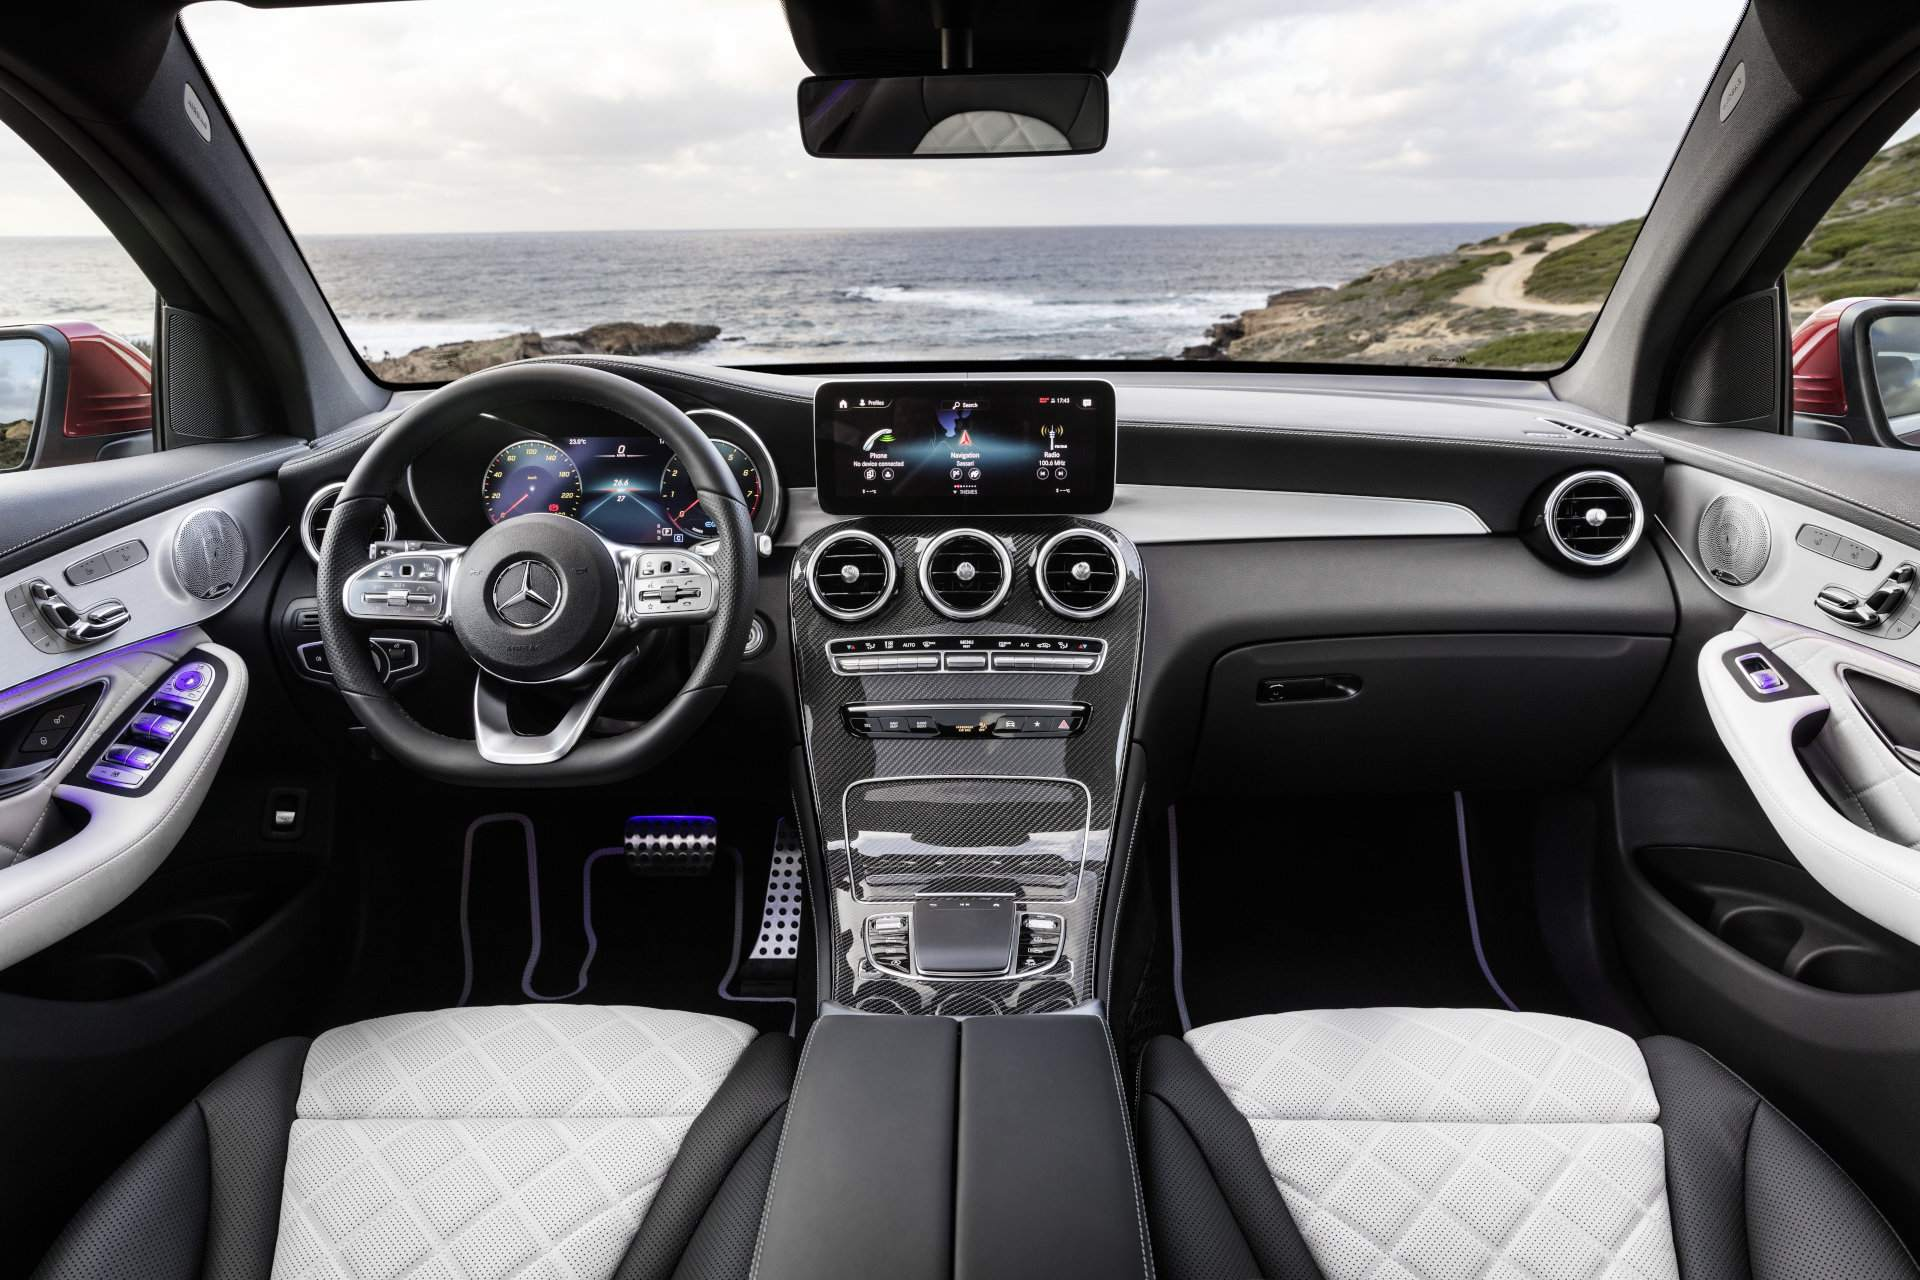 Mercedes Benz GLC Coupe 23